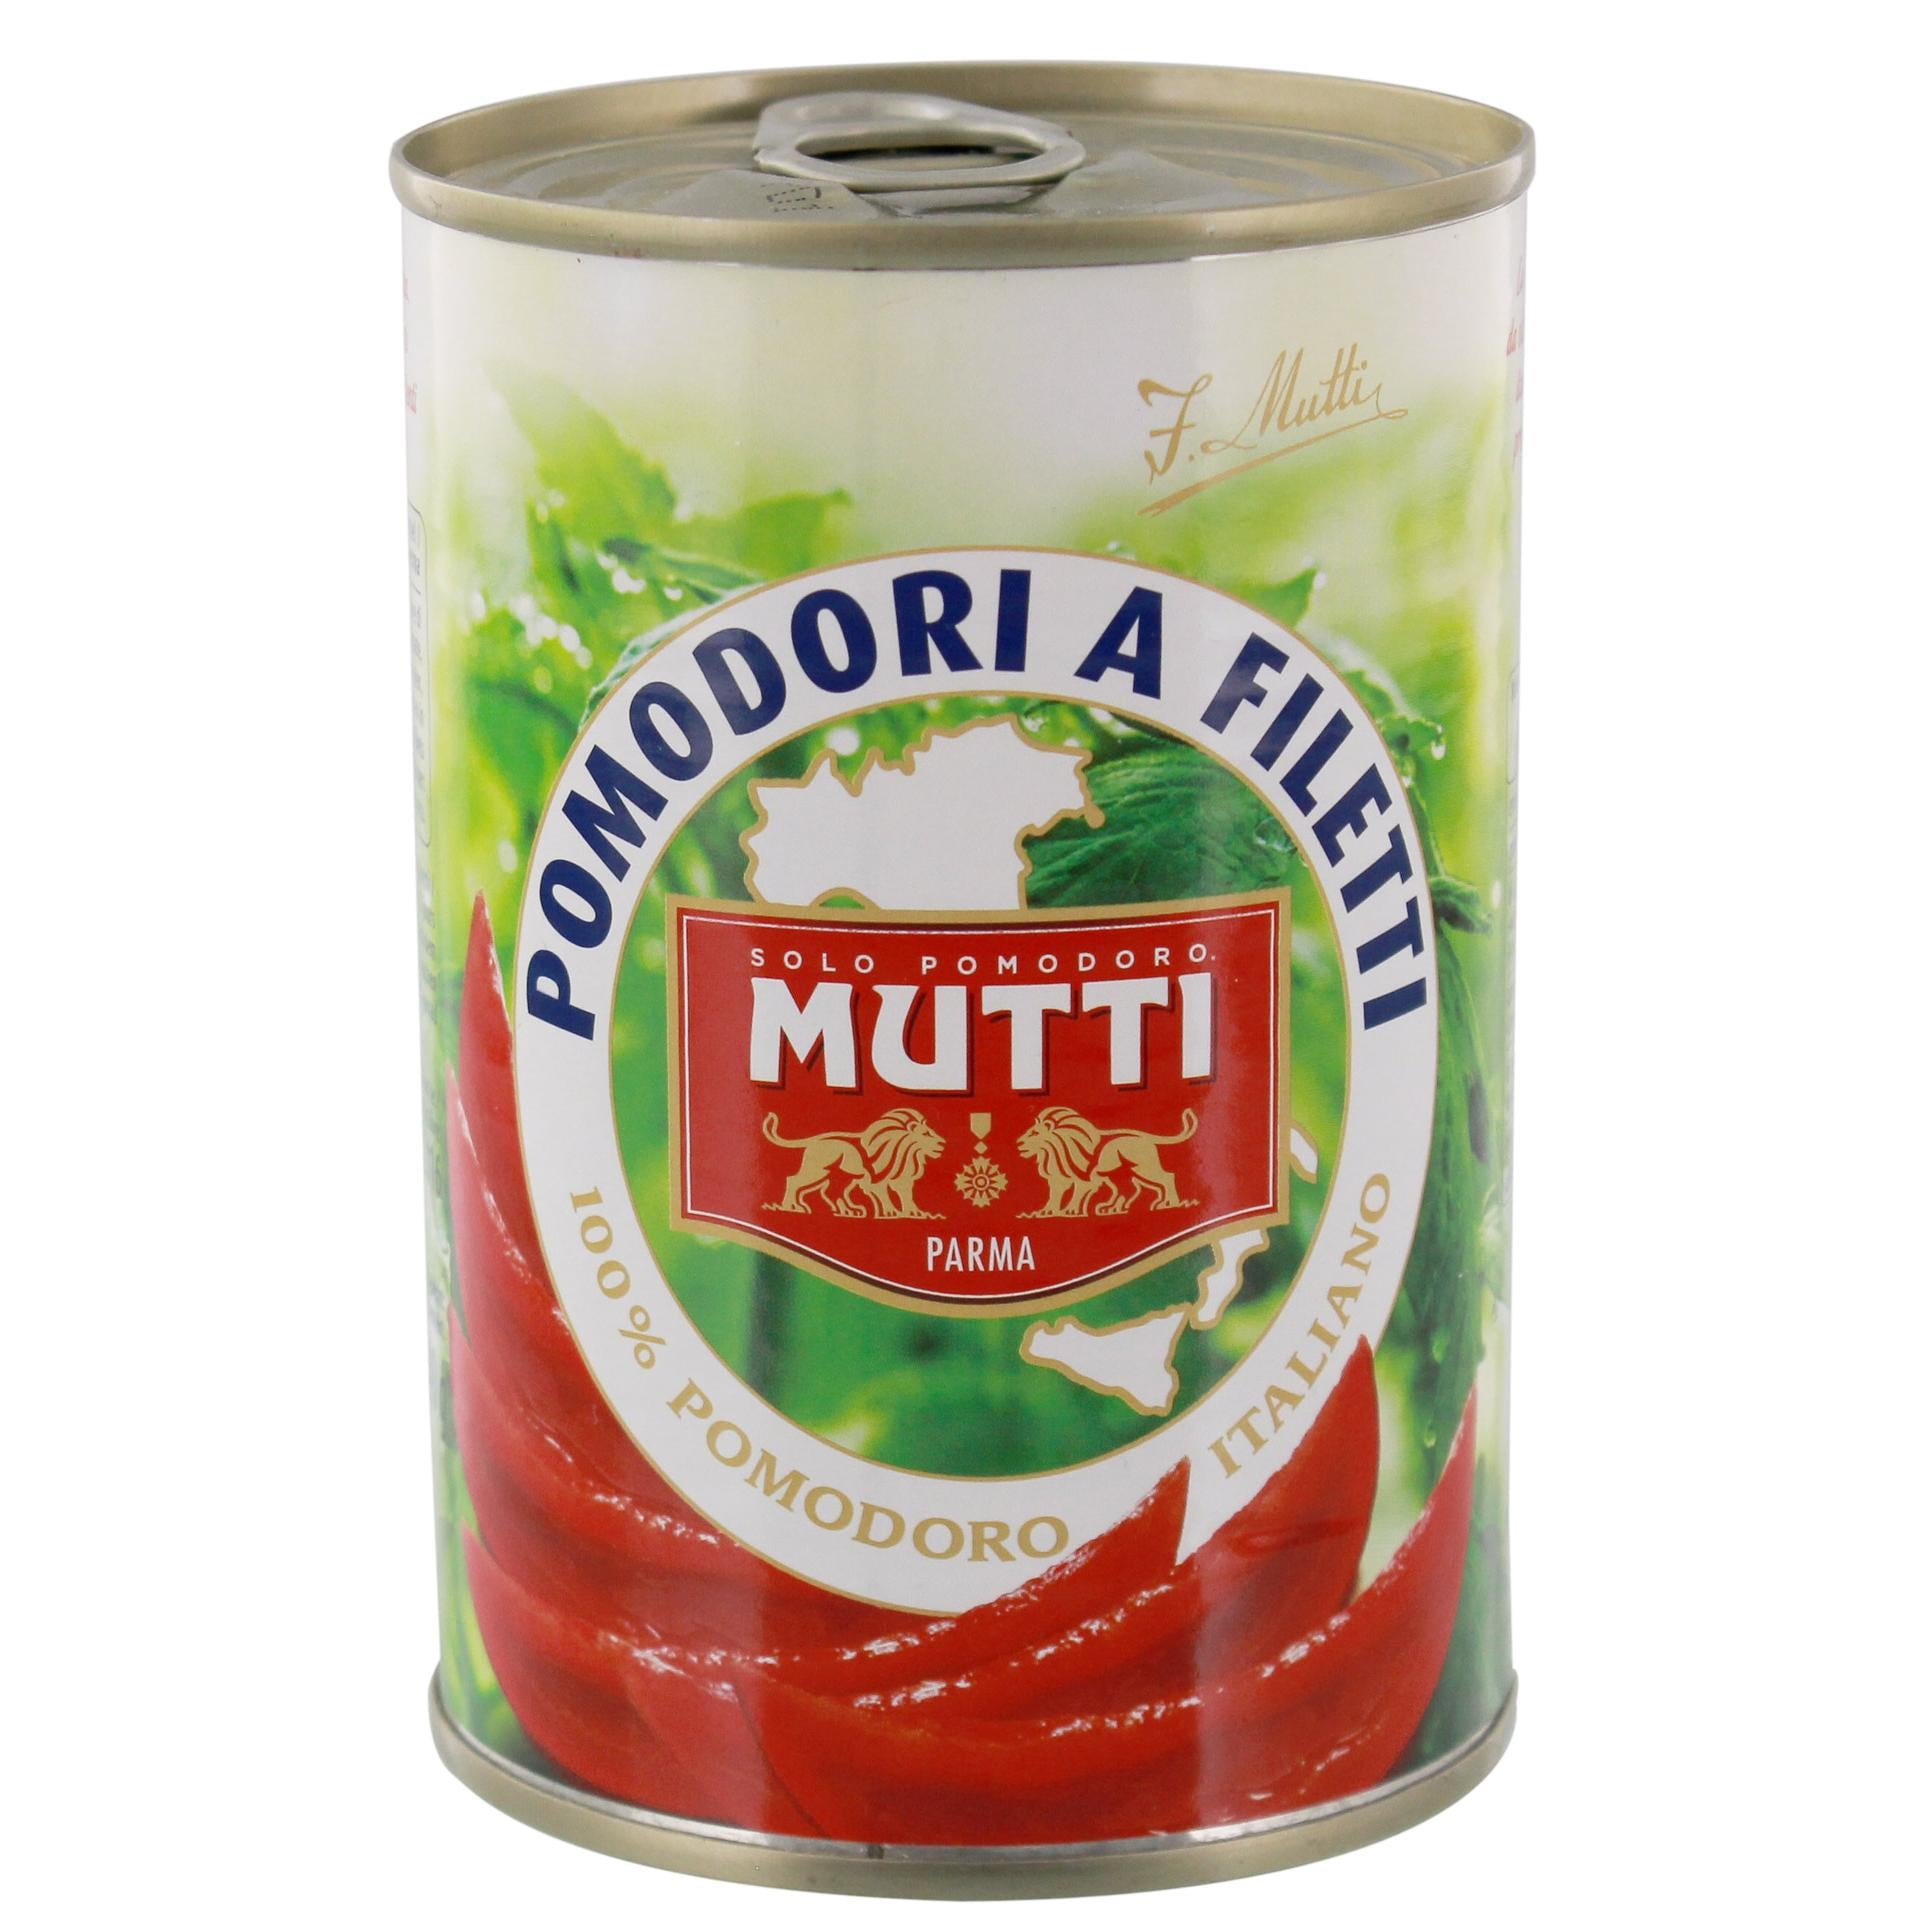 MUTTI Pomodori a filetti Tomatenfilets Dose 240g